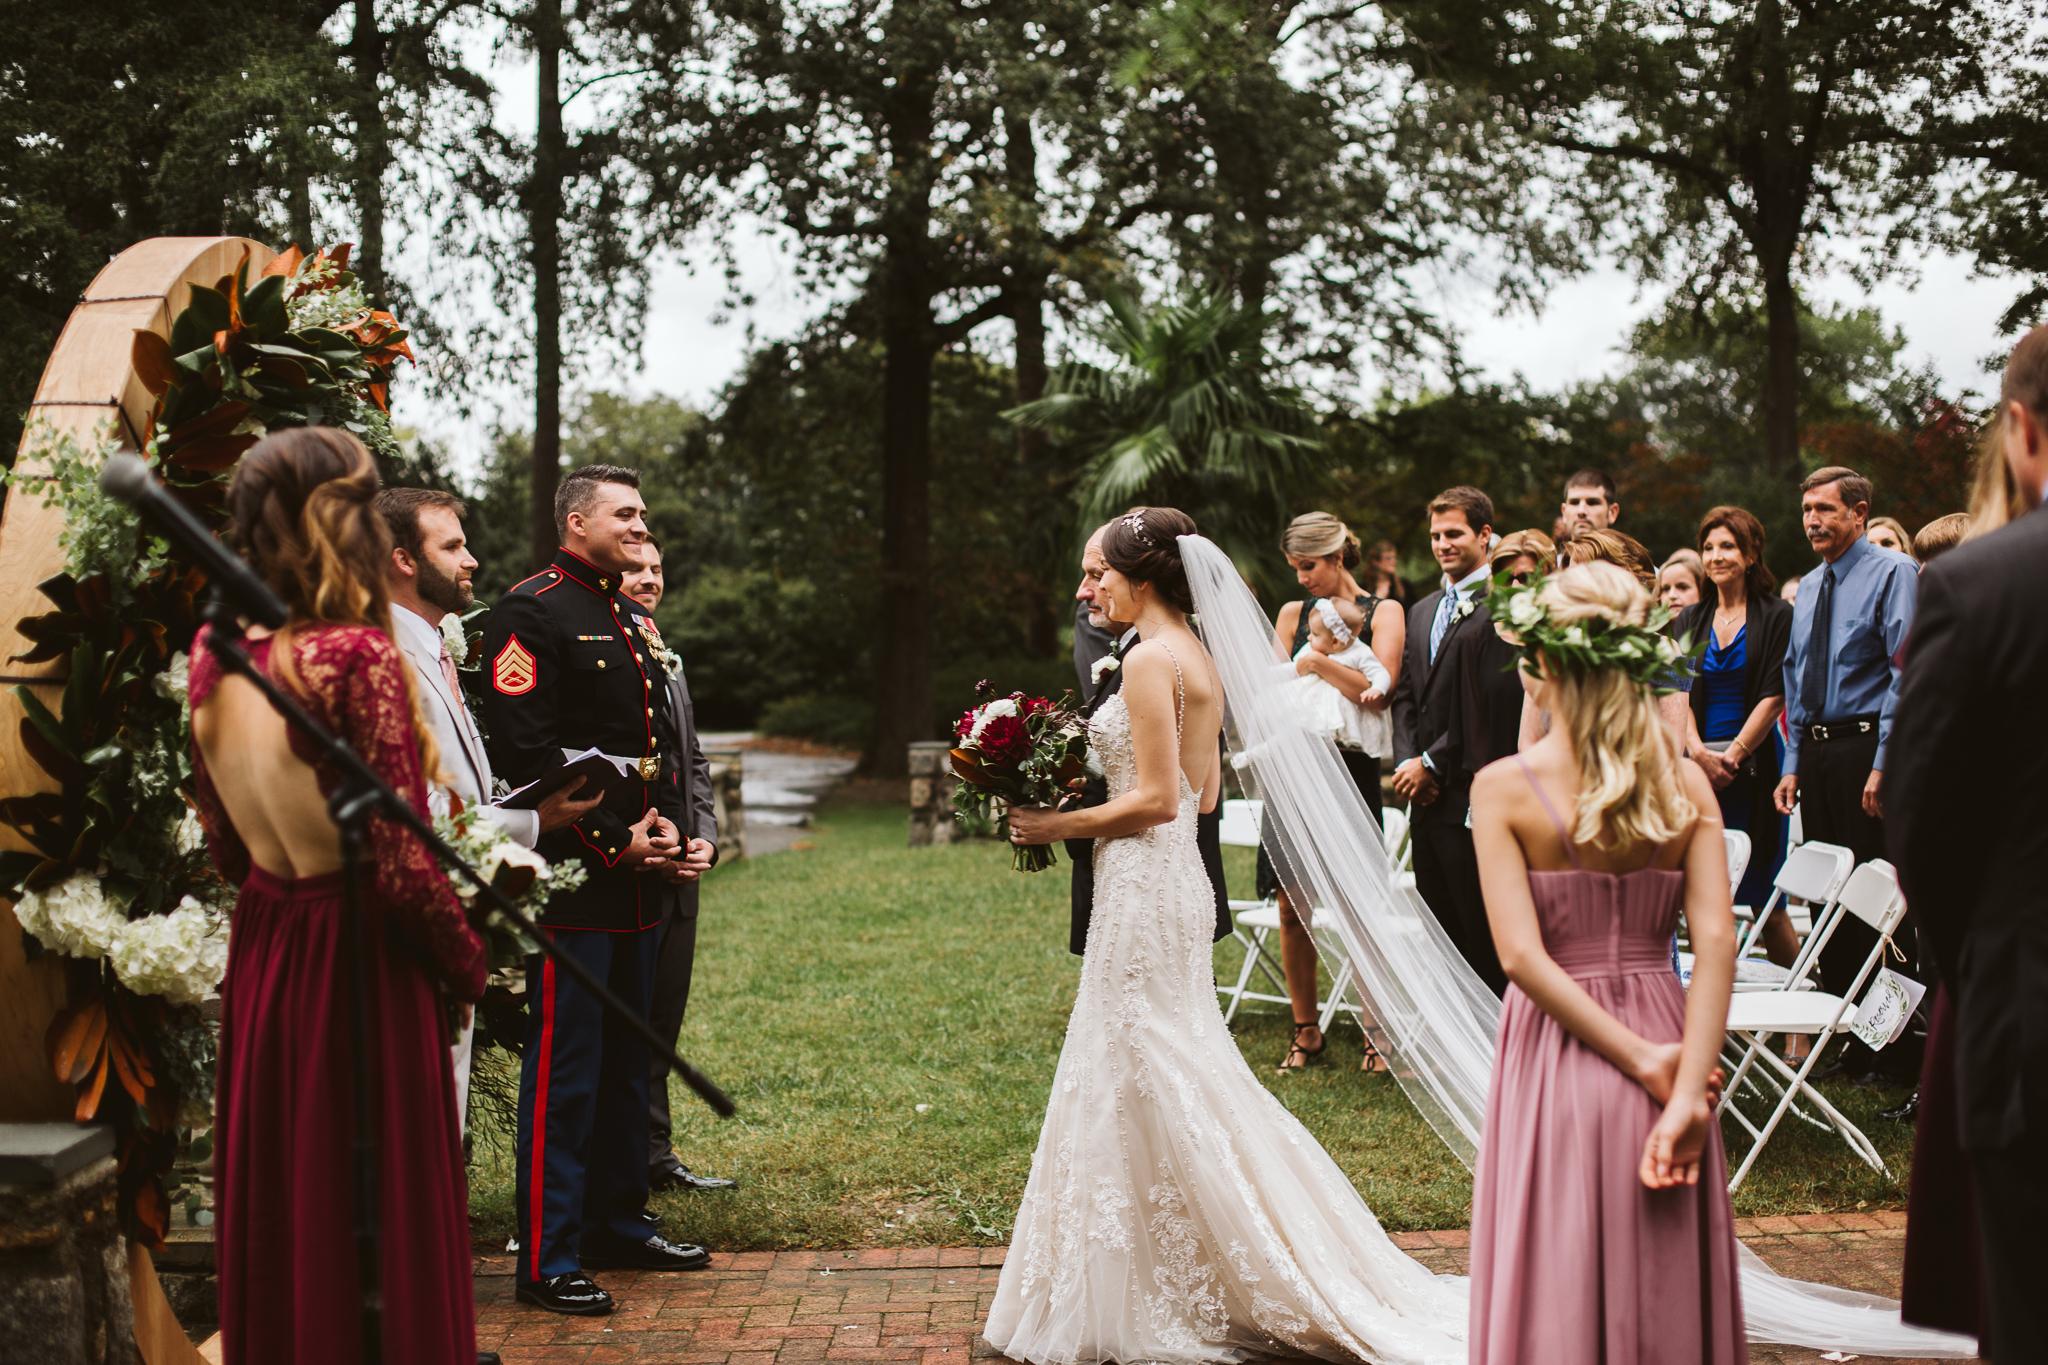 hamptonroads_wedding_norfolk_botanical_gardens-49.JPG